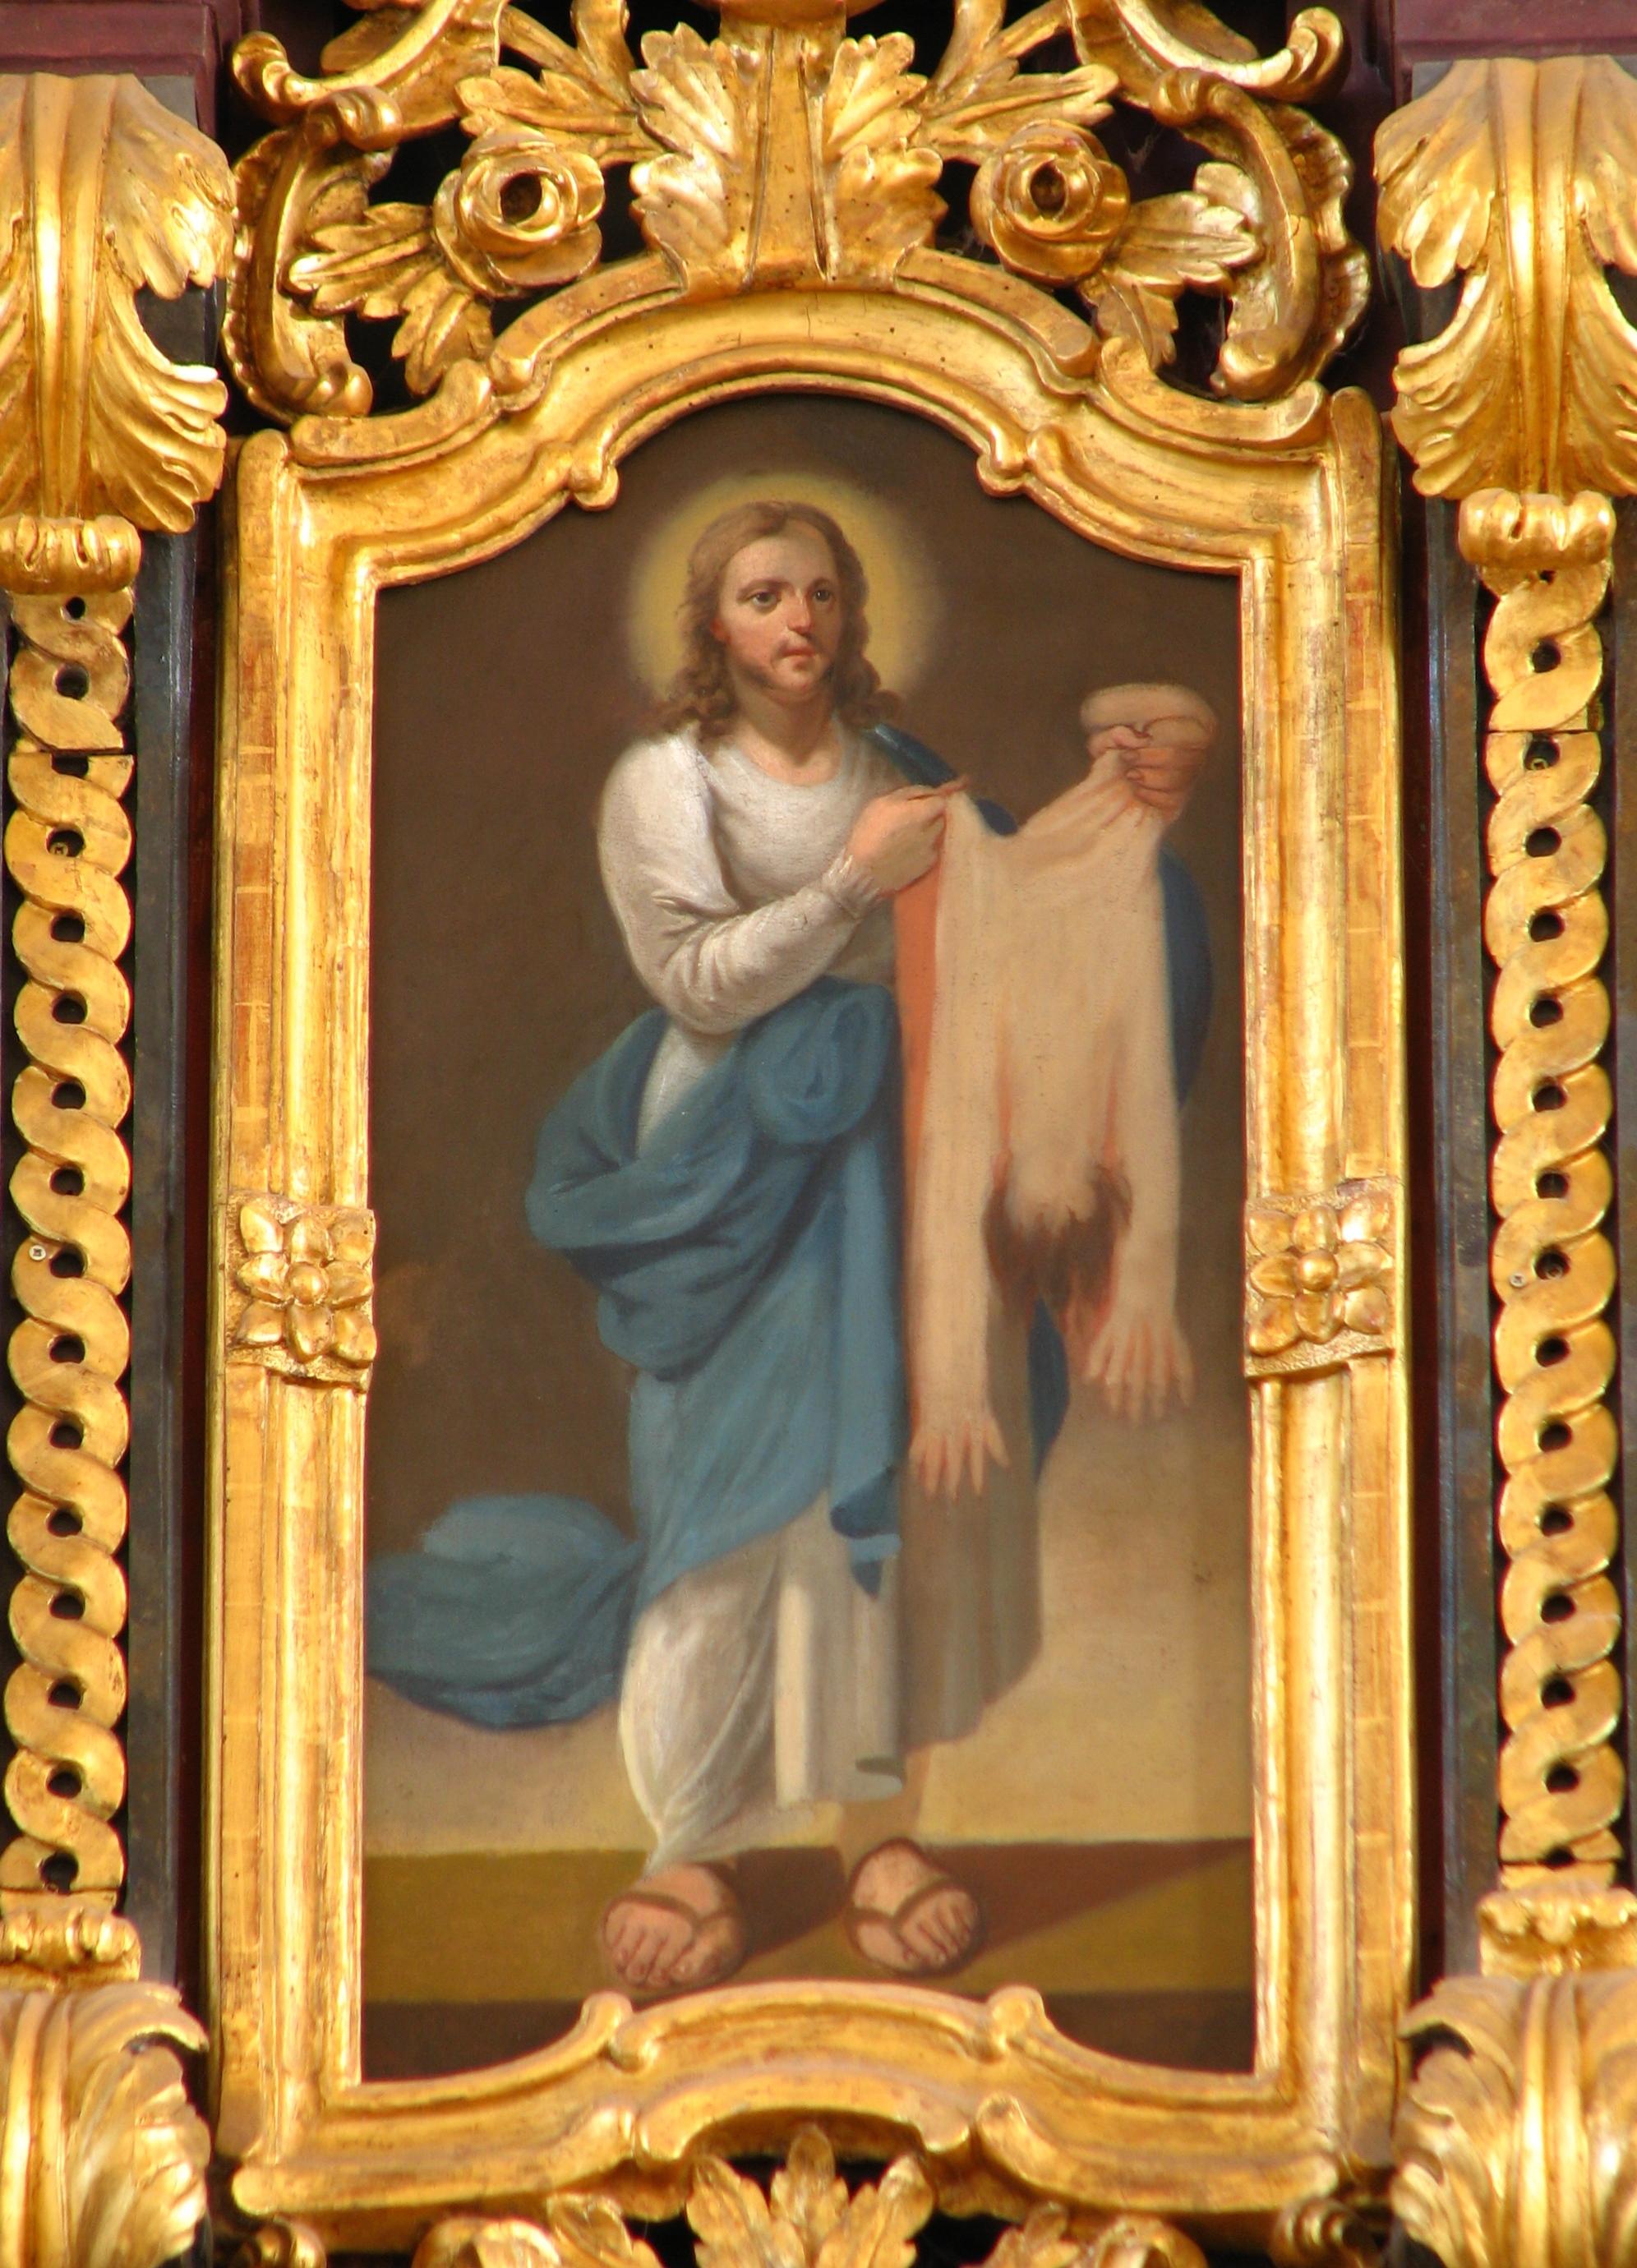 http://upload.wikimedia.org/wikipedia/commons/f/f4/Bartholomew_Apostle_Hajdudorog_Frame.jpg